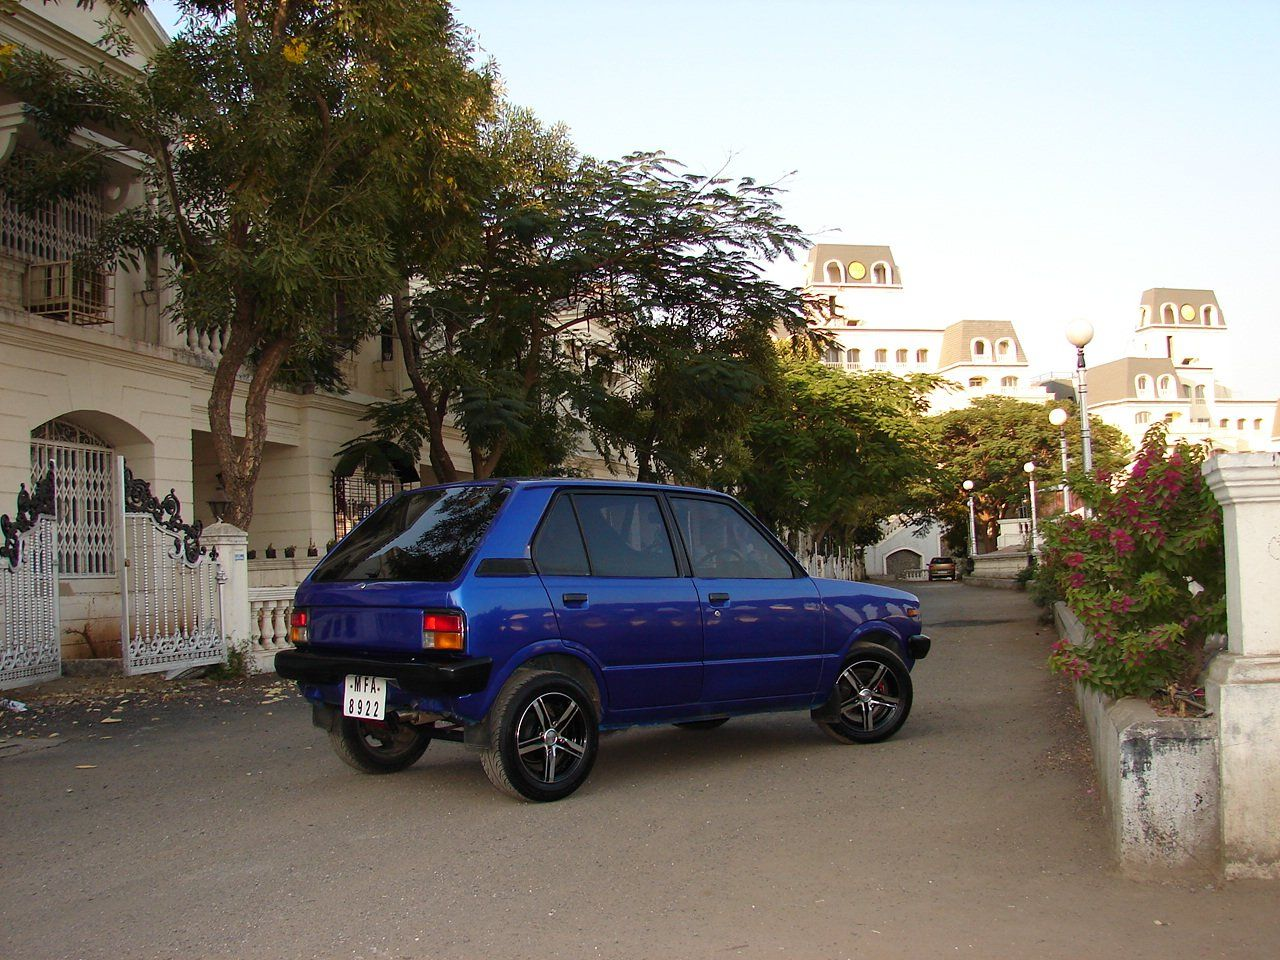 Pin By Ashwani Pareek On Dreamers Car In The World Modified